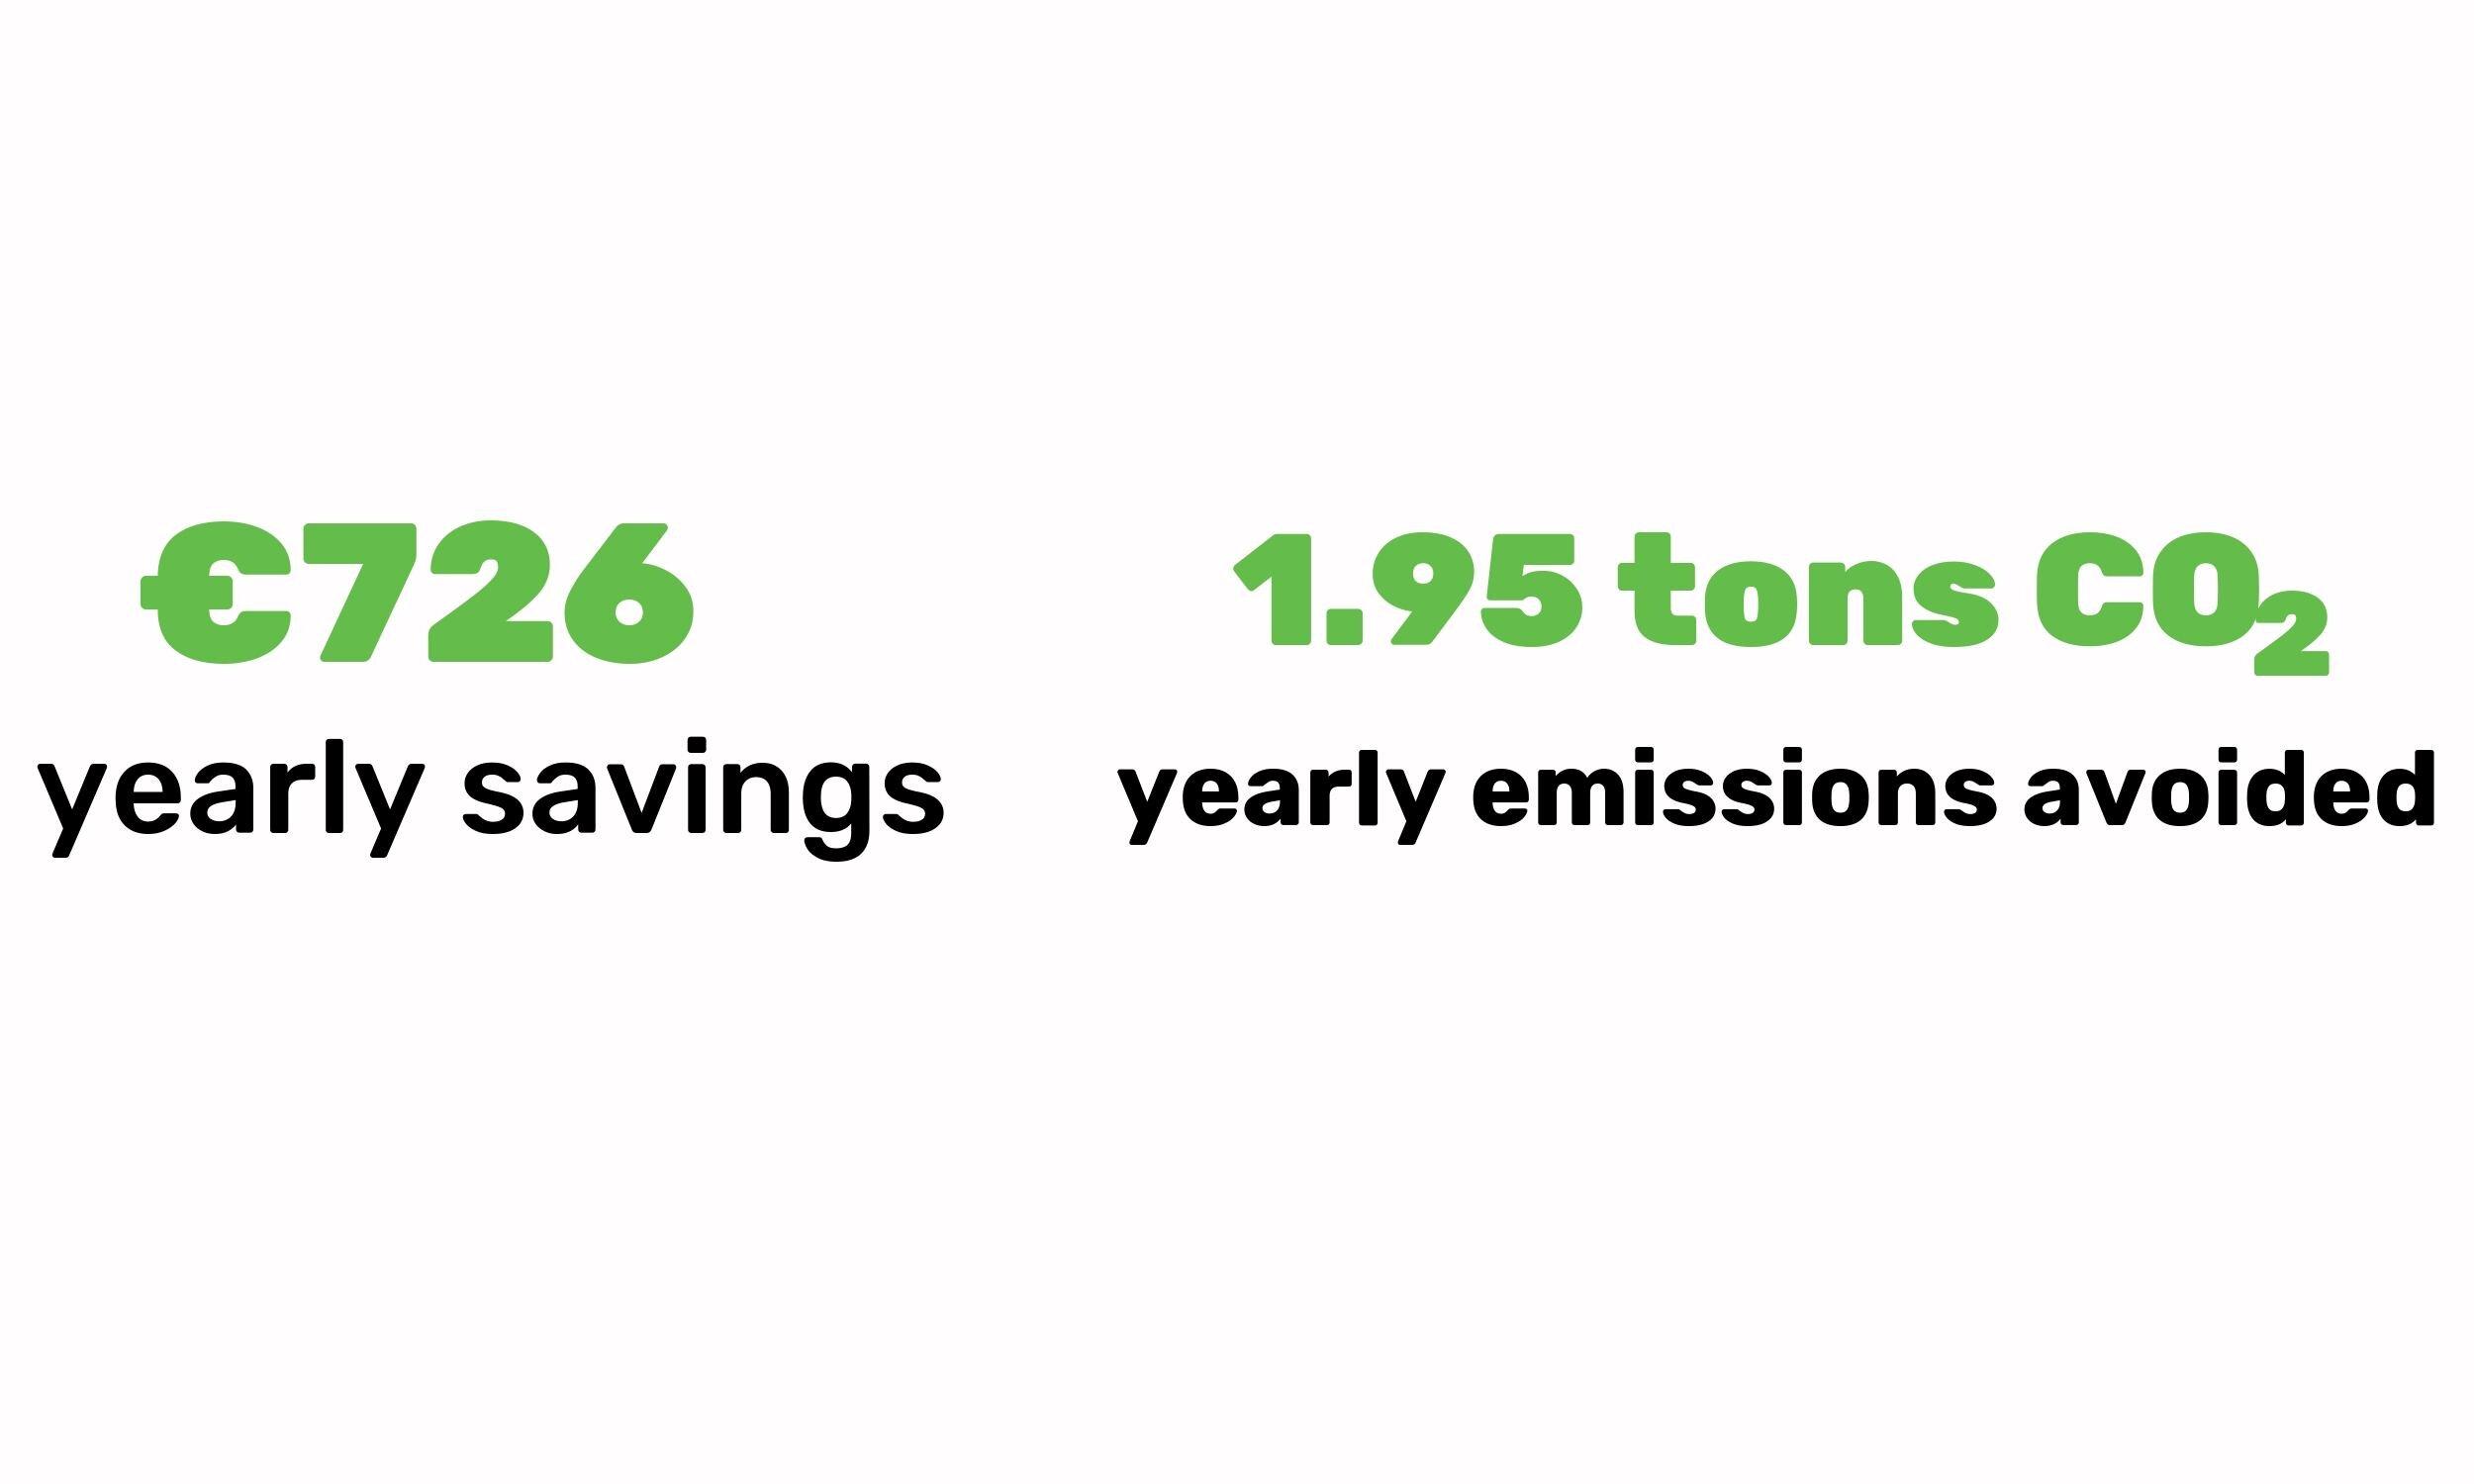 VIVACITY  green roofs and walls yearly savings blog study jpg